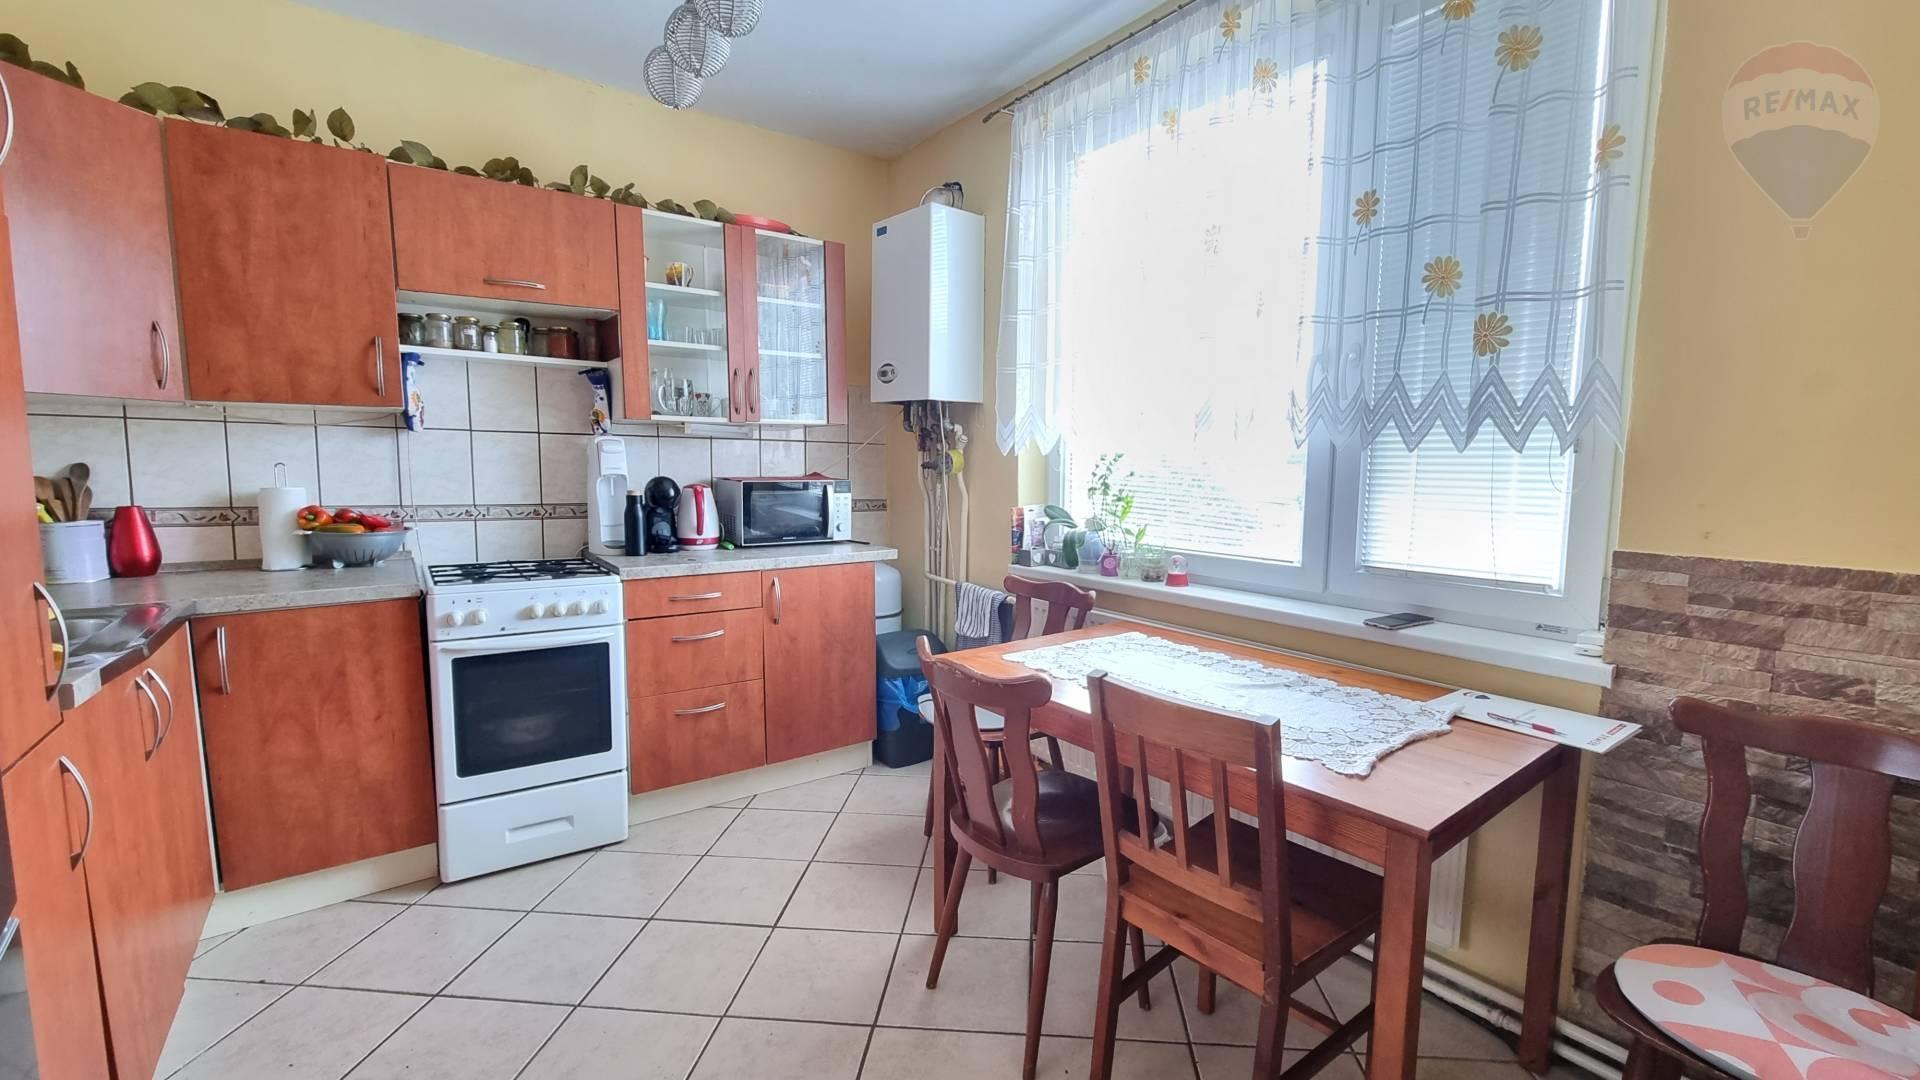 Predám 3 izbový byt, balkón, pivnica, KRTOVCE